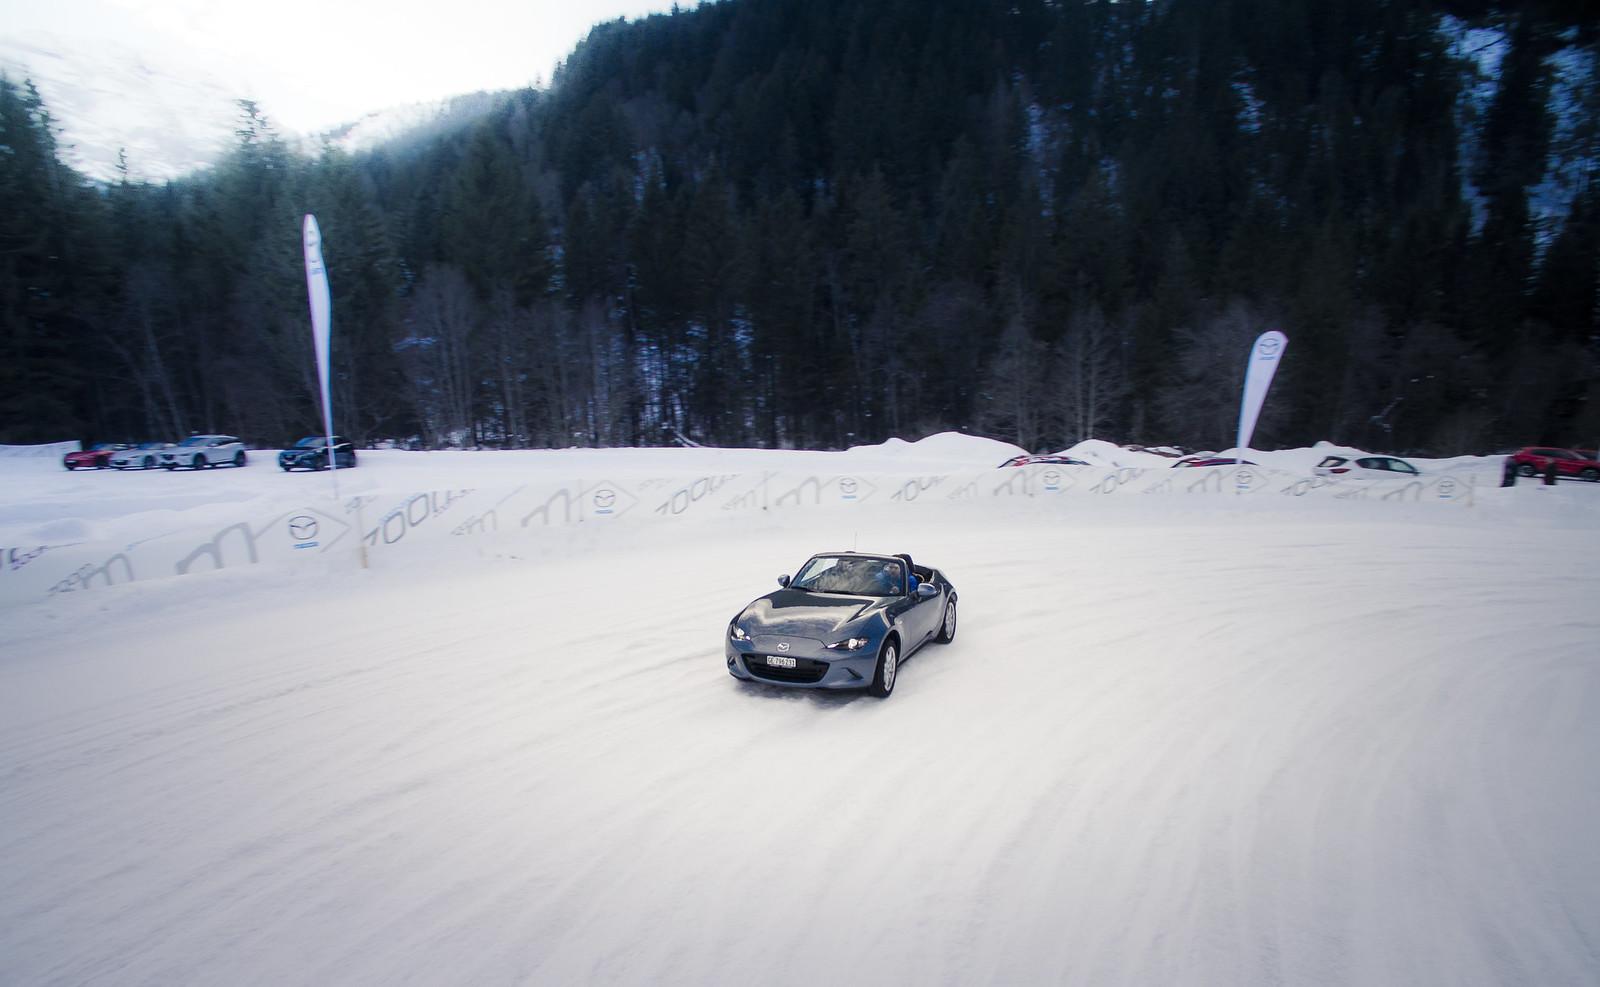 Mazda Millenia White Snow Milly Logbook: Mazda Snow Xperience - 30.01.2016